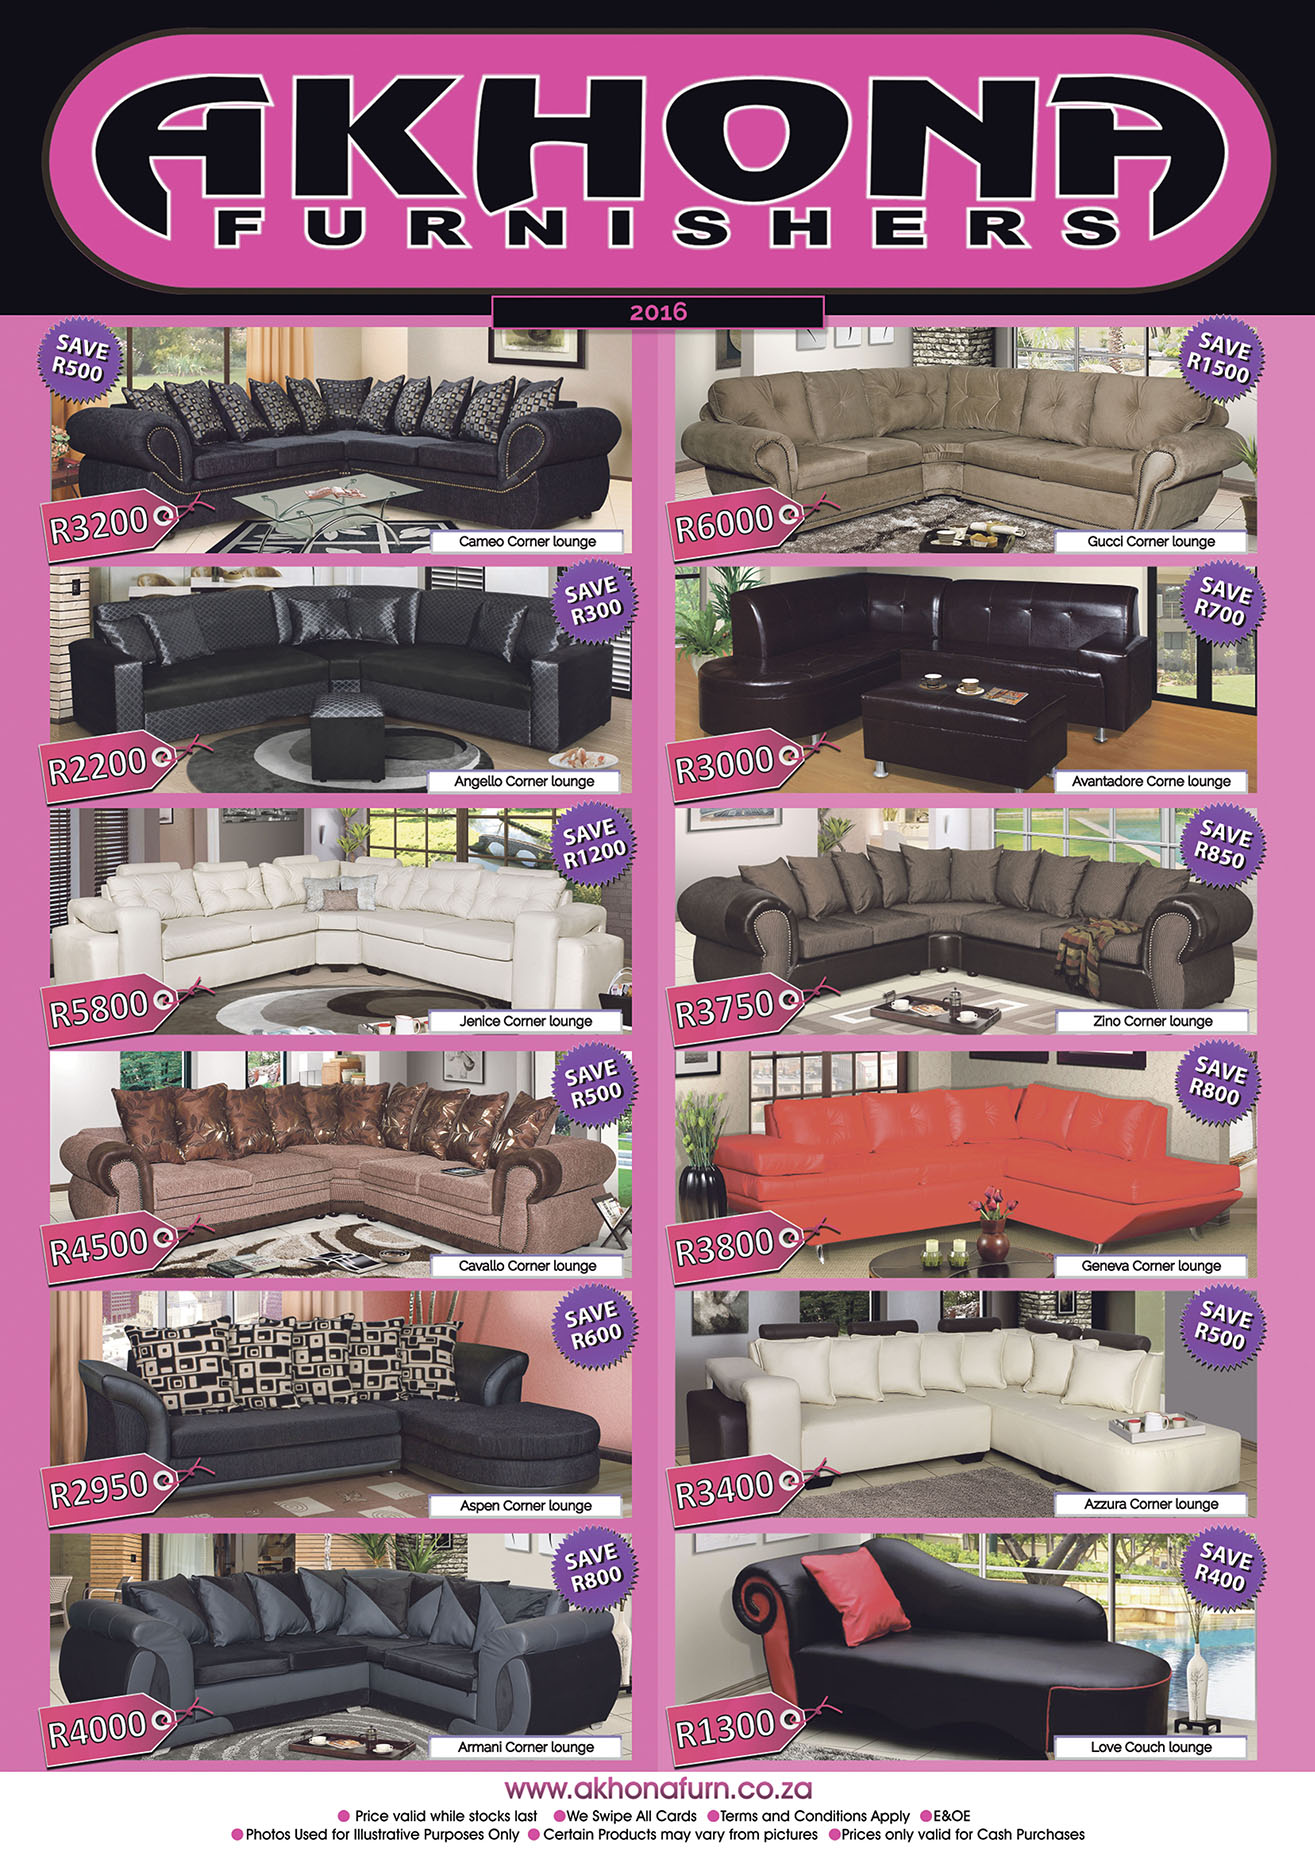 Akhona Furniture Shop Products Akhona Furnishers